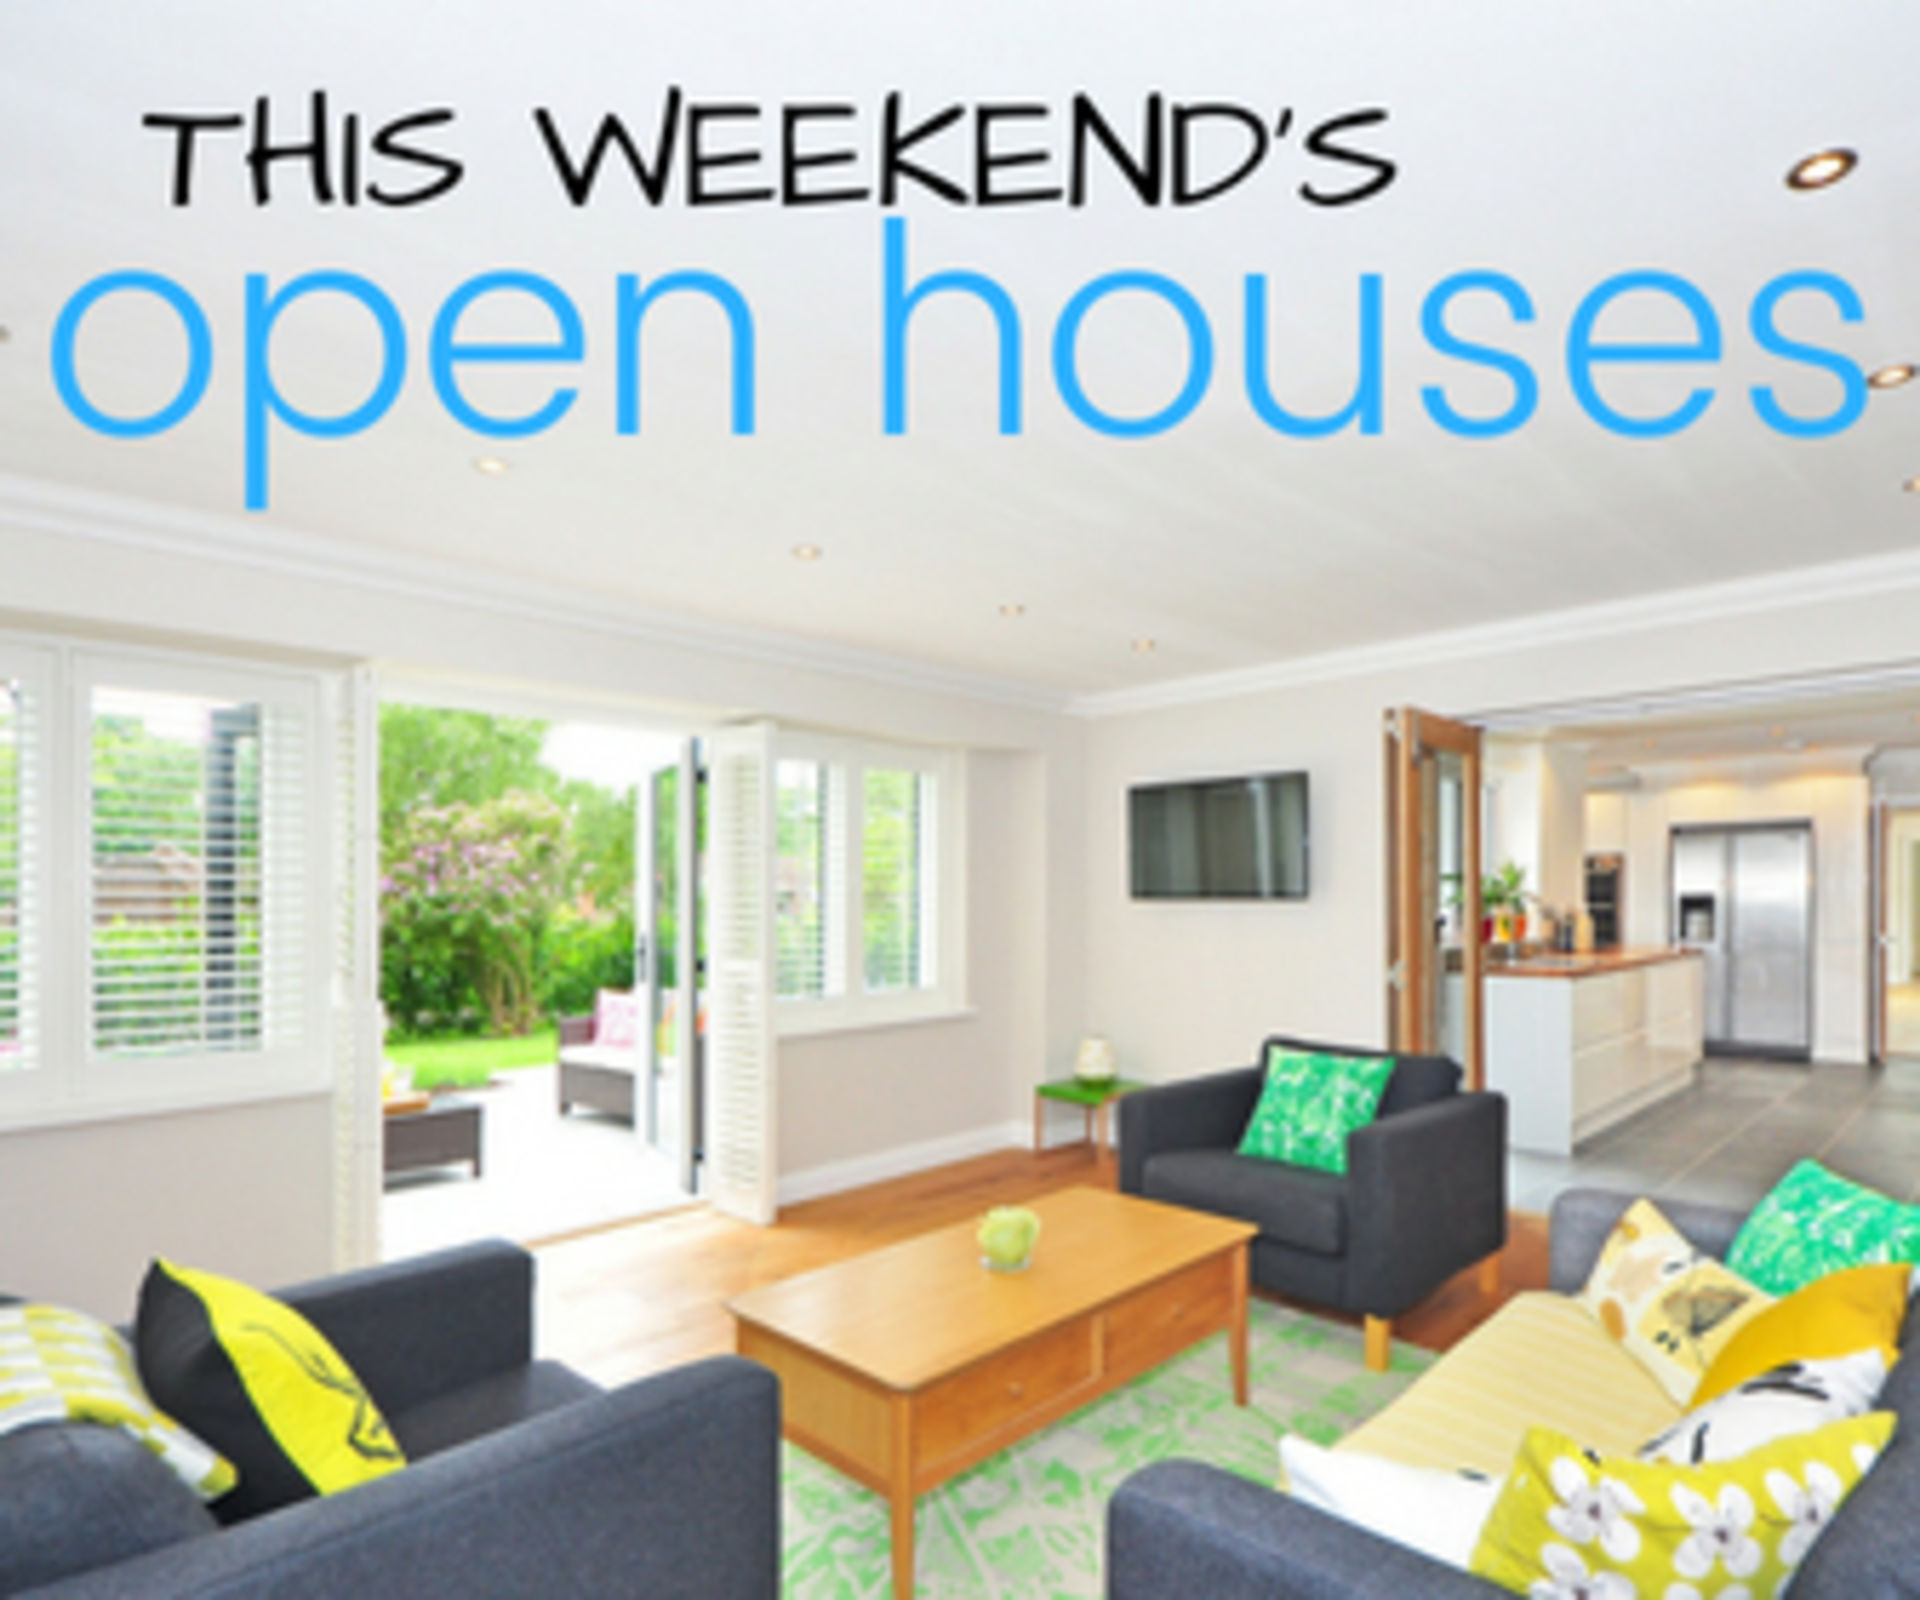 2 OPEN HOUSES this Weekend! Lenexa and Shawnee!